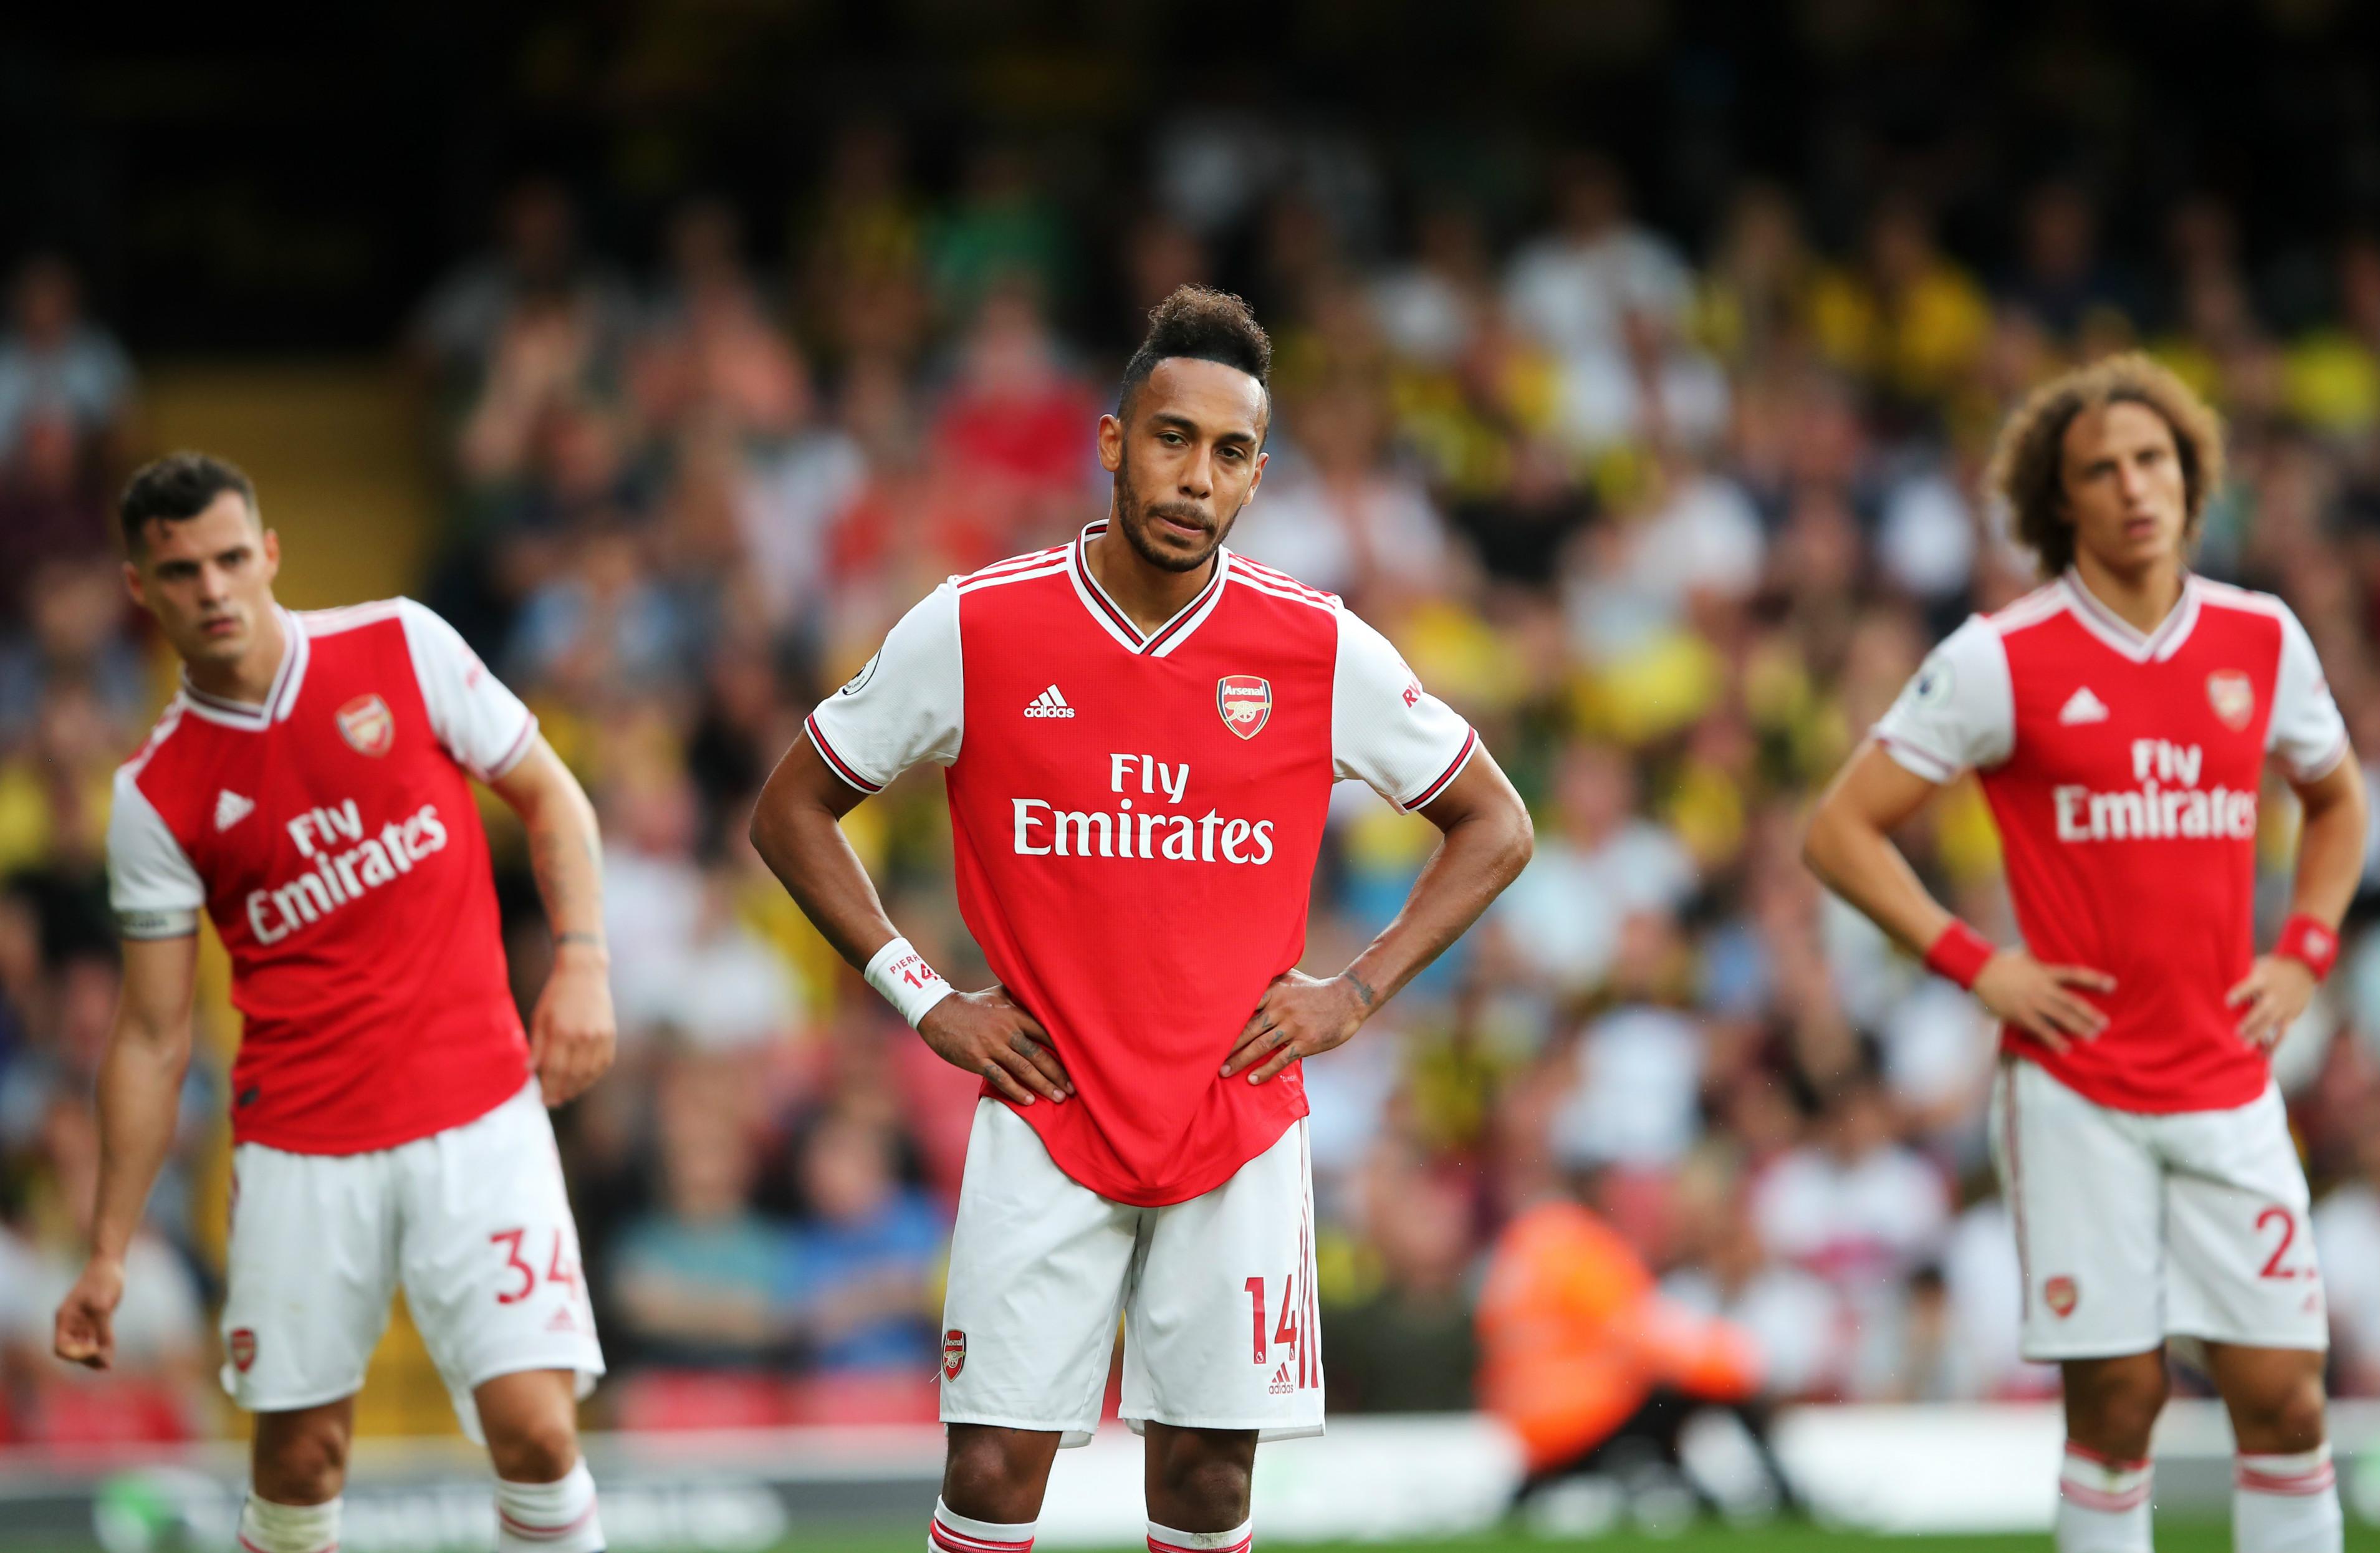 David Luiz, Pierre-Emerick Aubameyang, Granit Xhaka, Watford v Arsenal, 2019